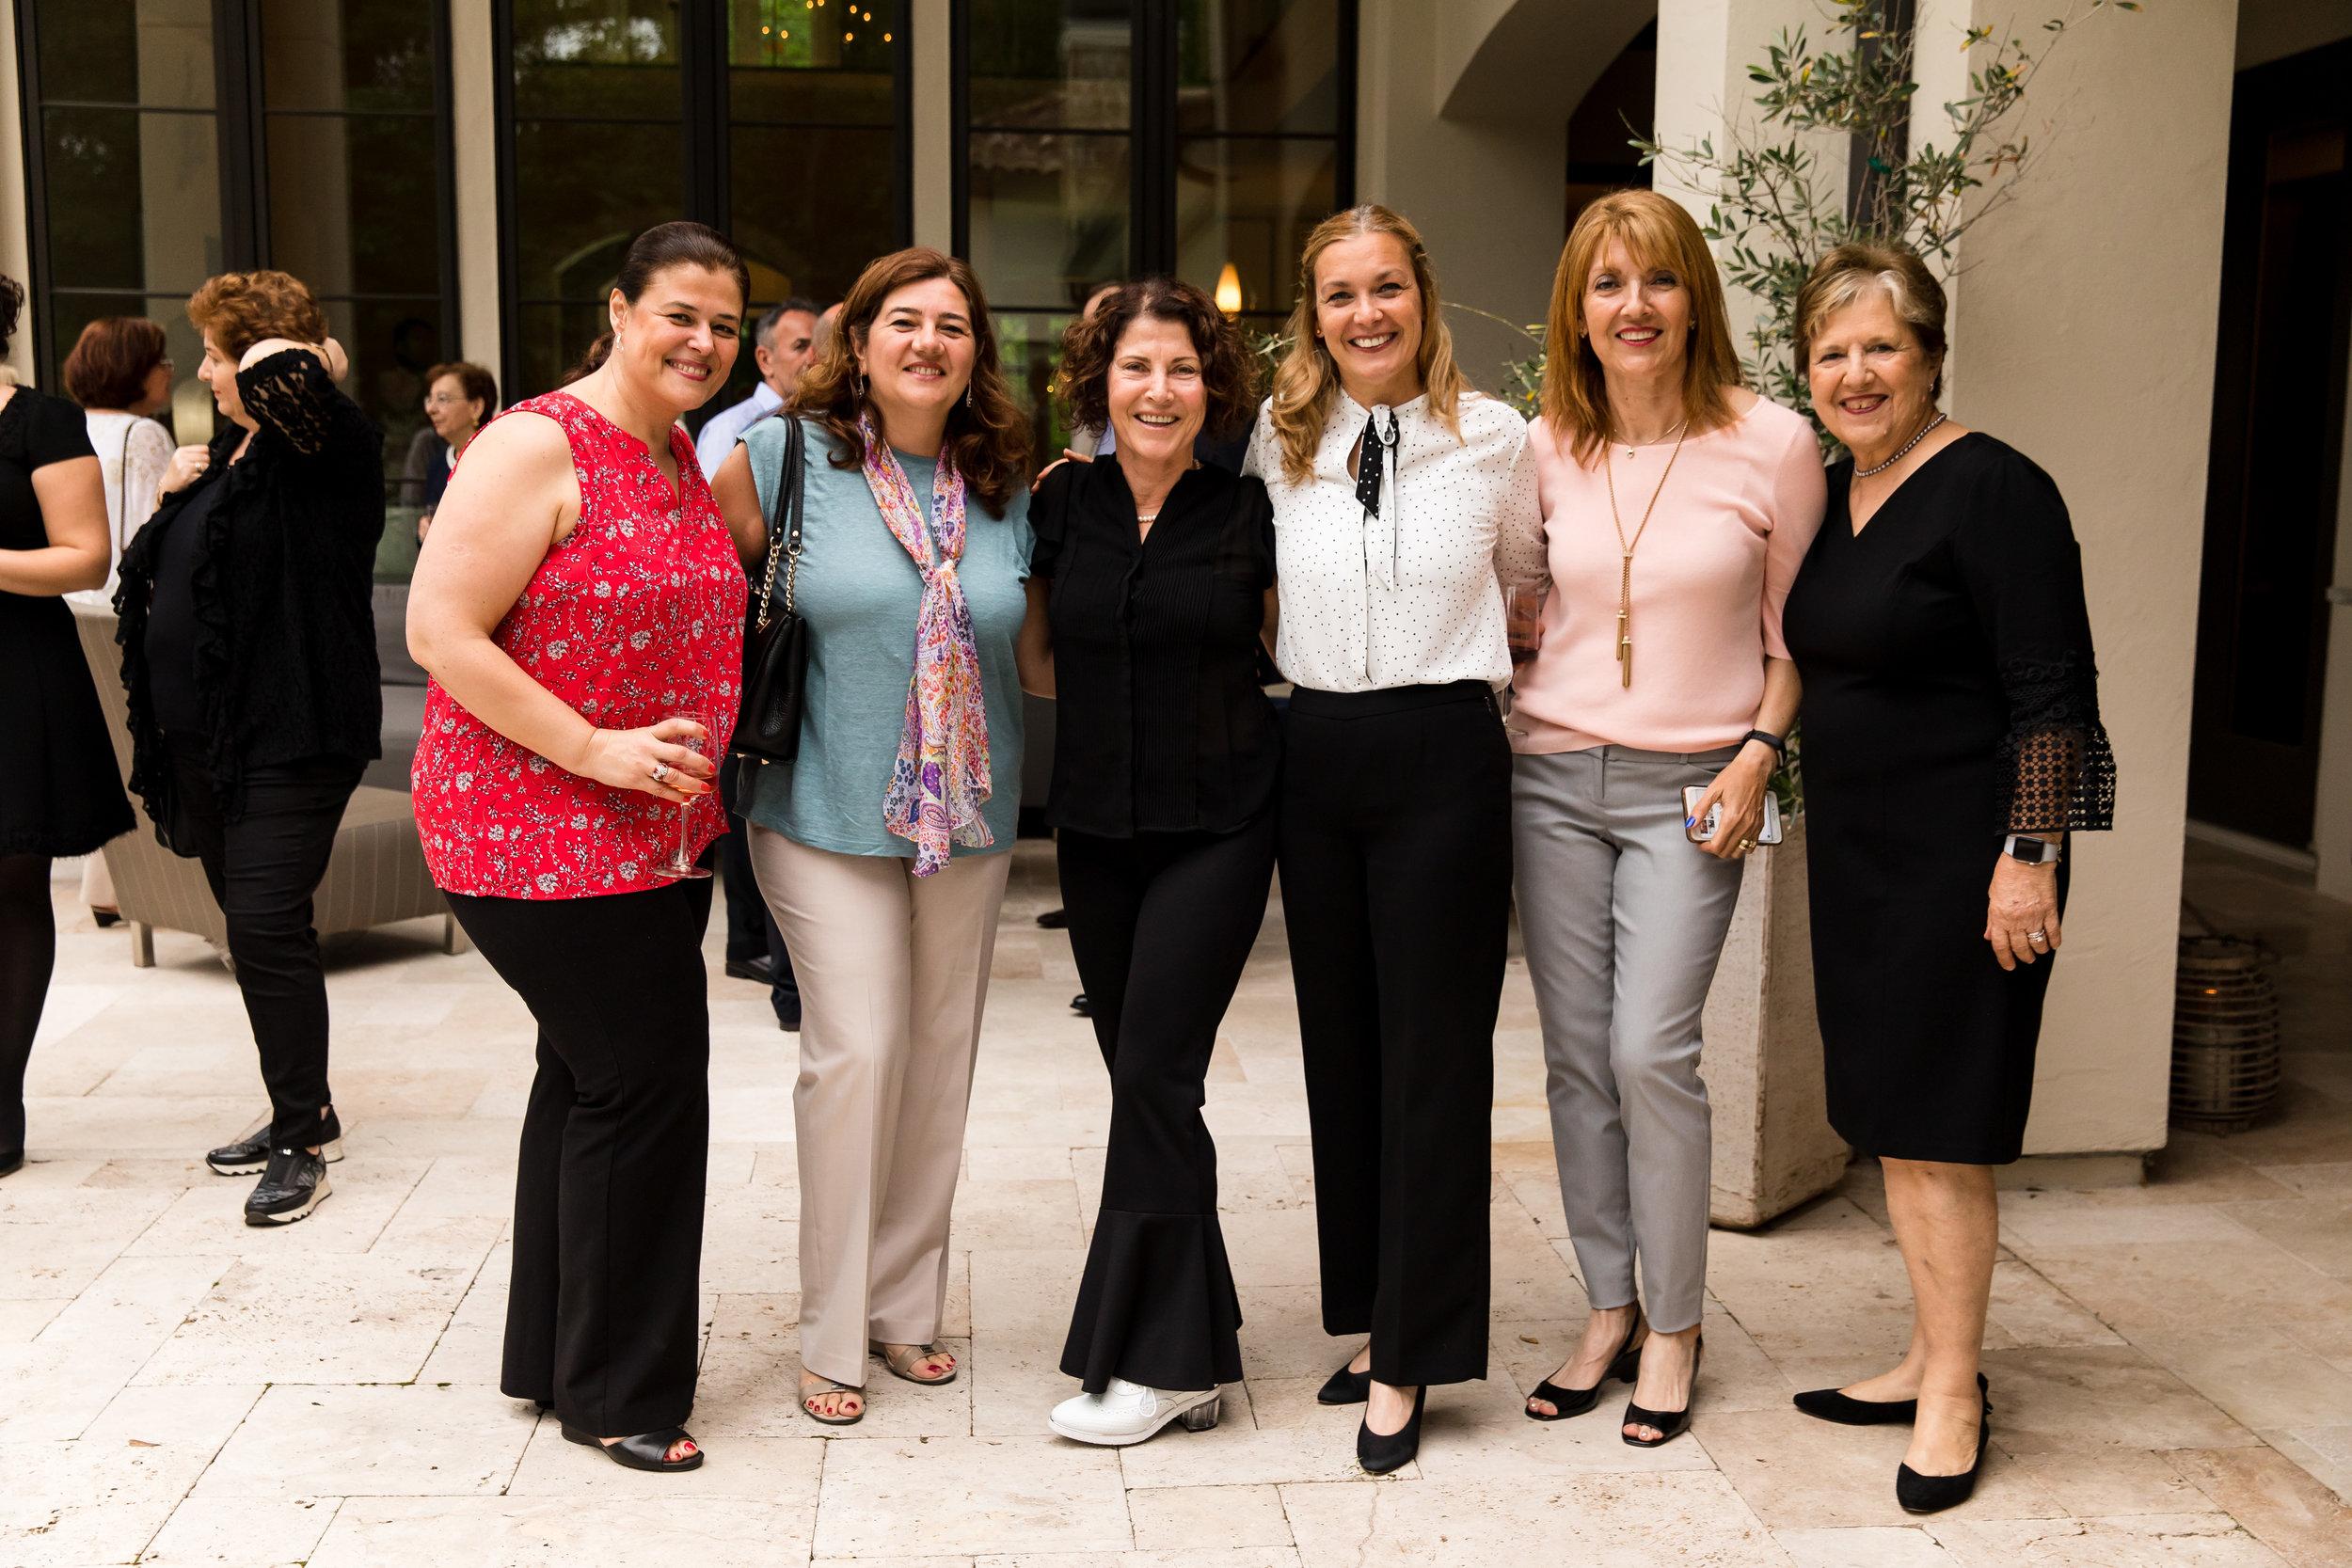 20180421-3rd Annual Education Women Turkey-183.jpg